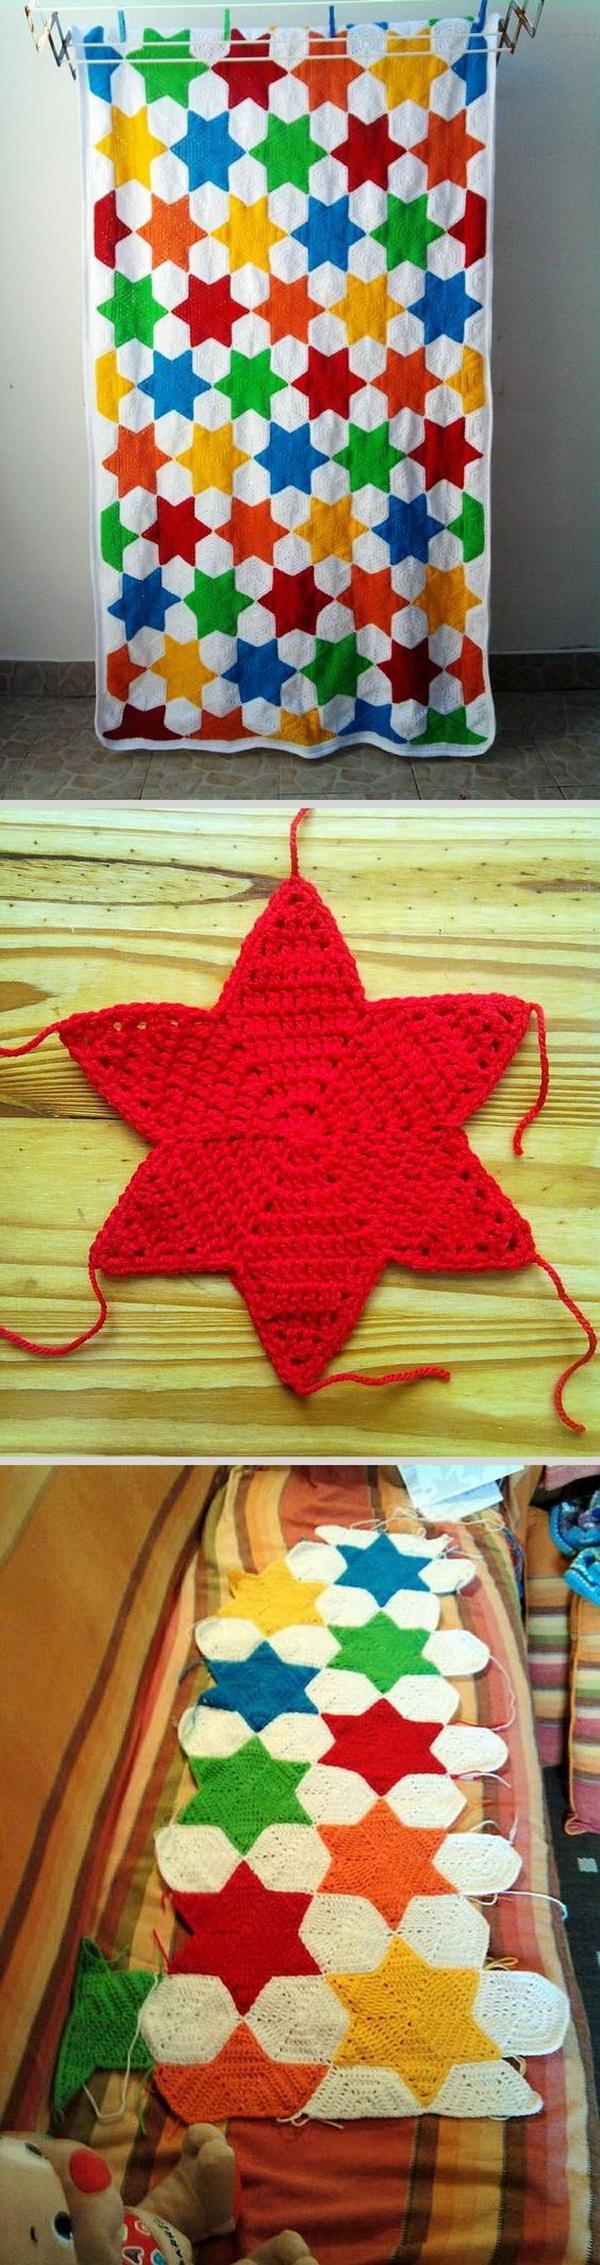 Quick And Easy Crochet Blanket Patterns For Beginners: Hexagon-based Star Blanket.